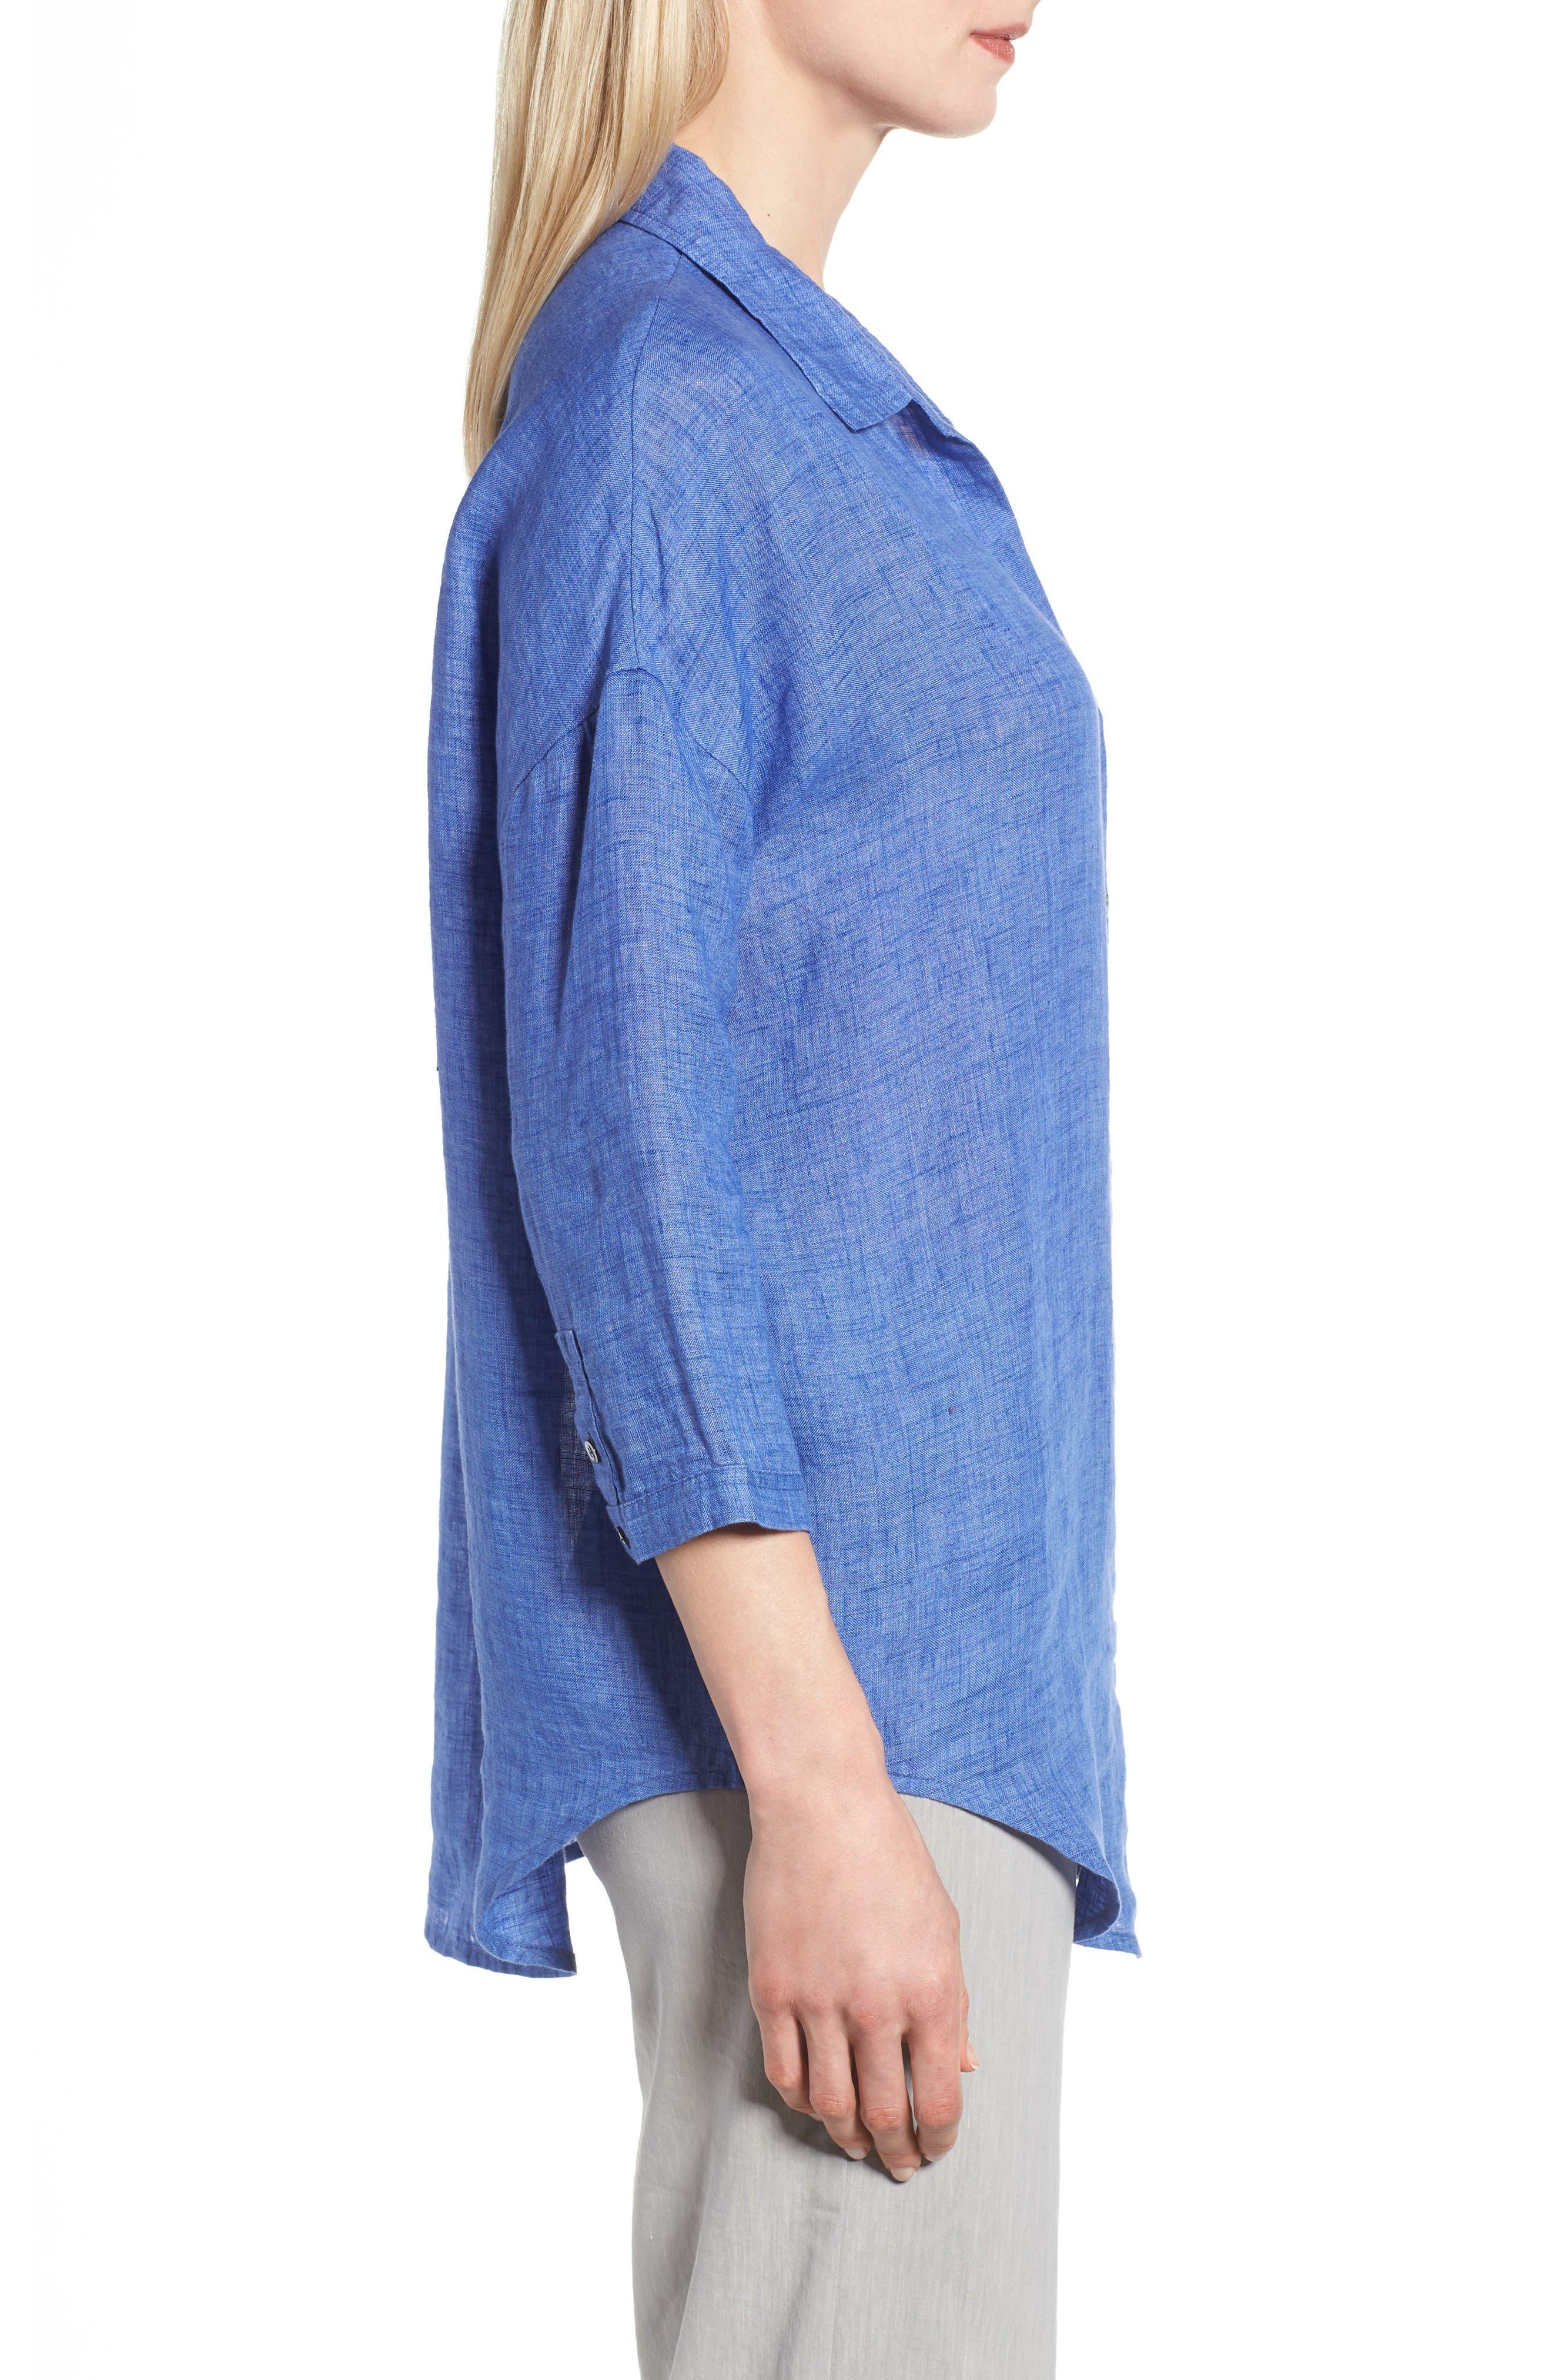 Joy Ride Linen Tunic Top,                             Alternate thumbnail 3, color,                             Ultramarine